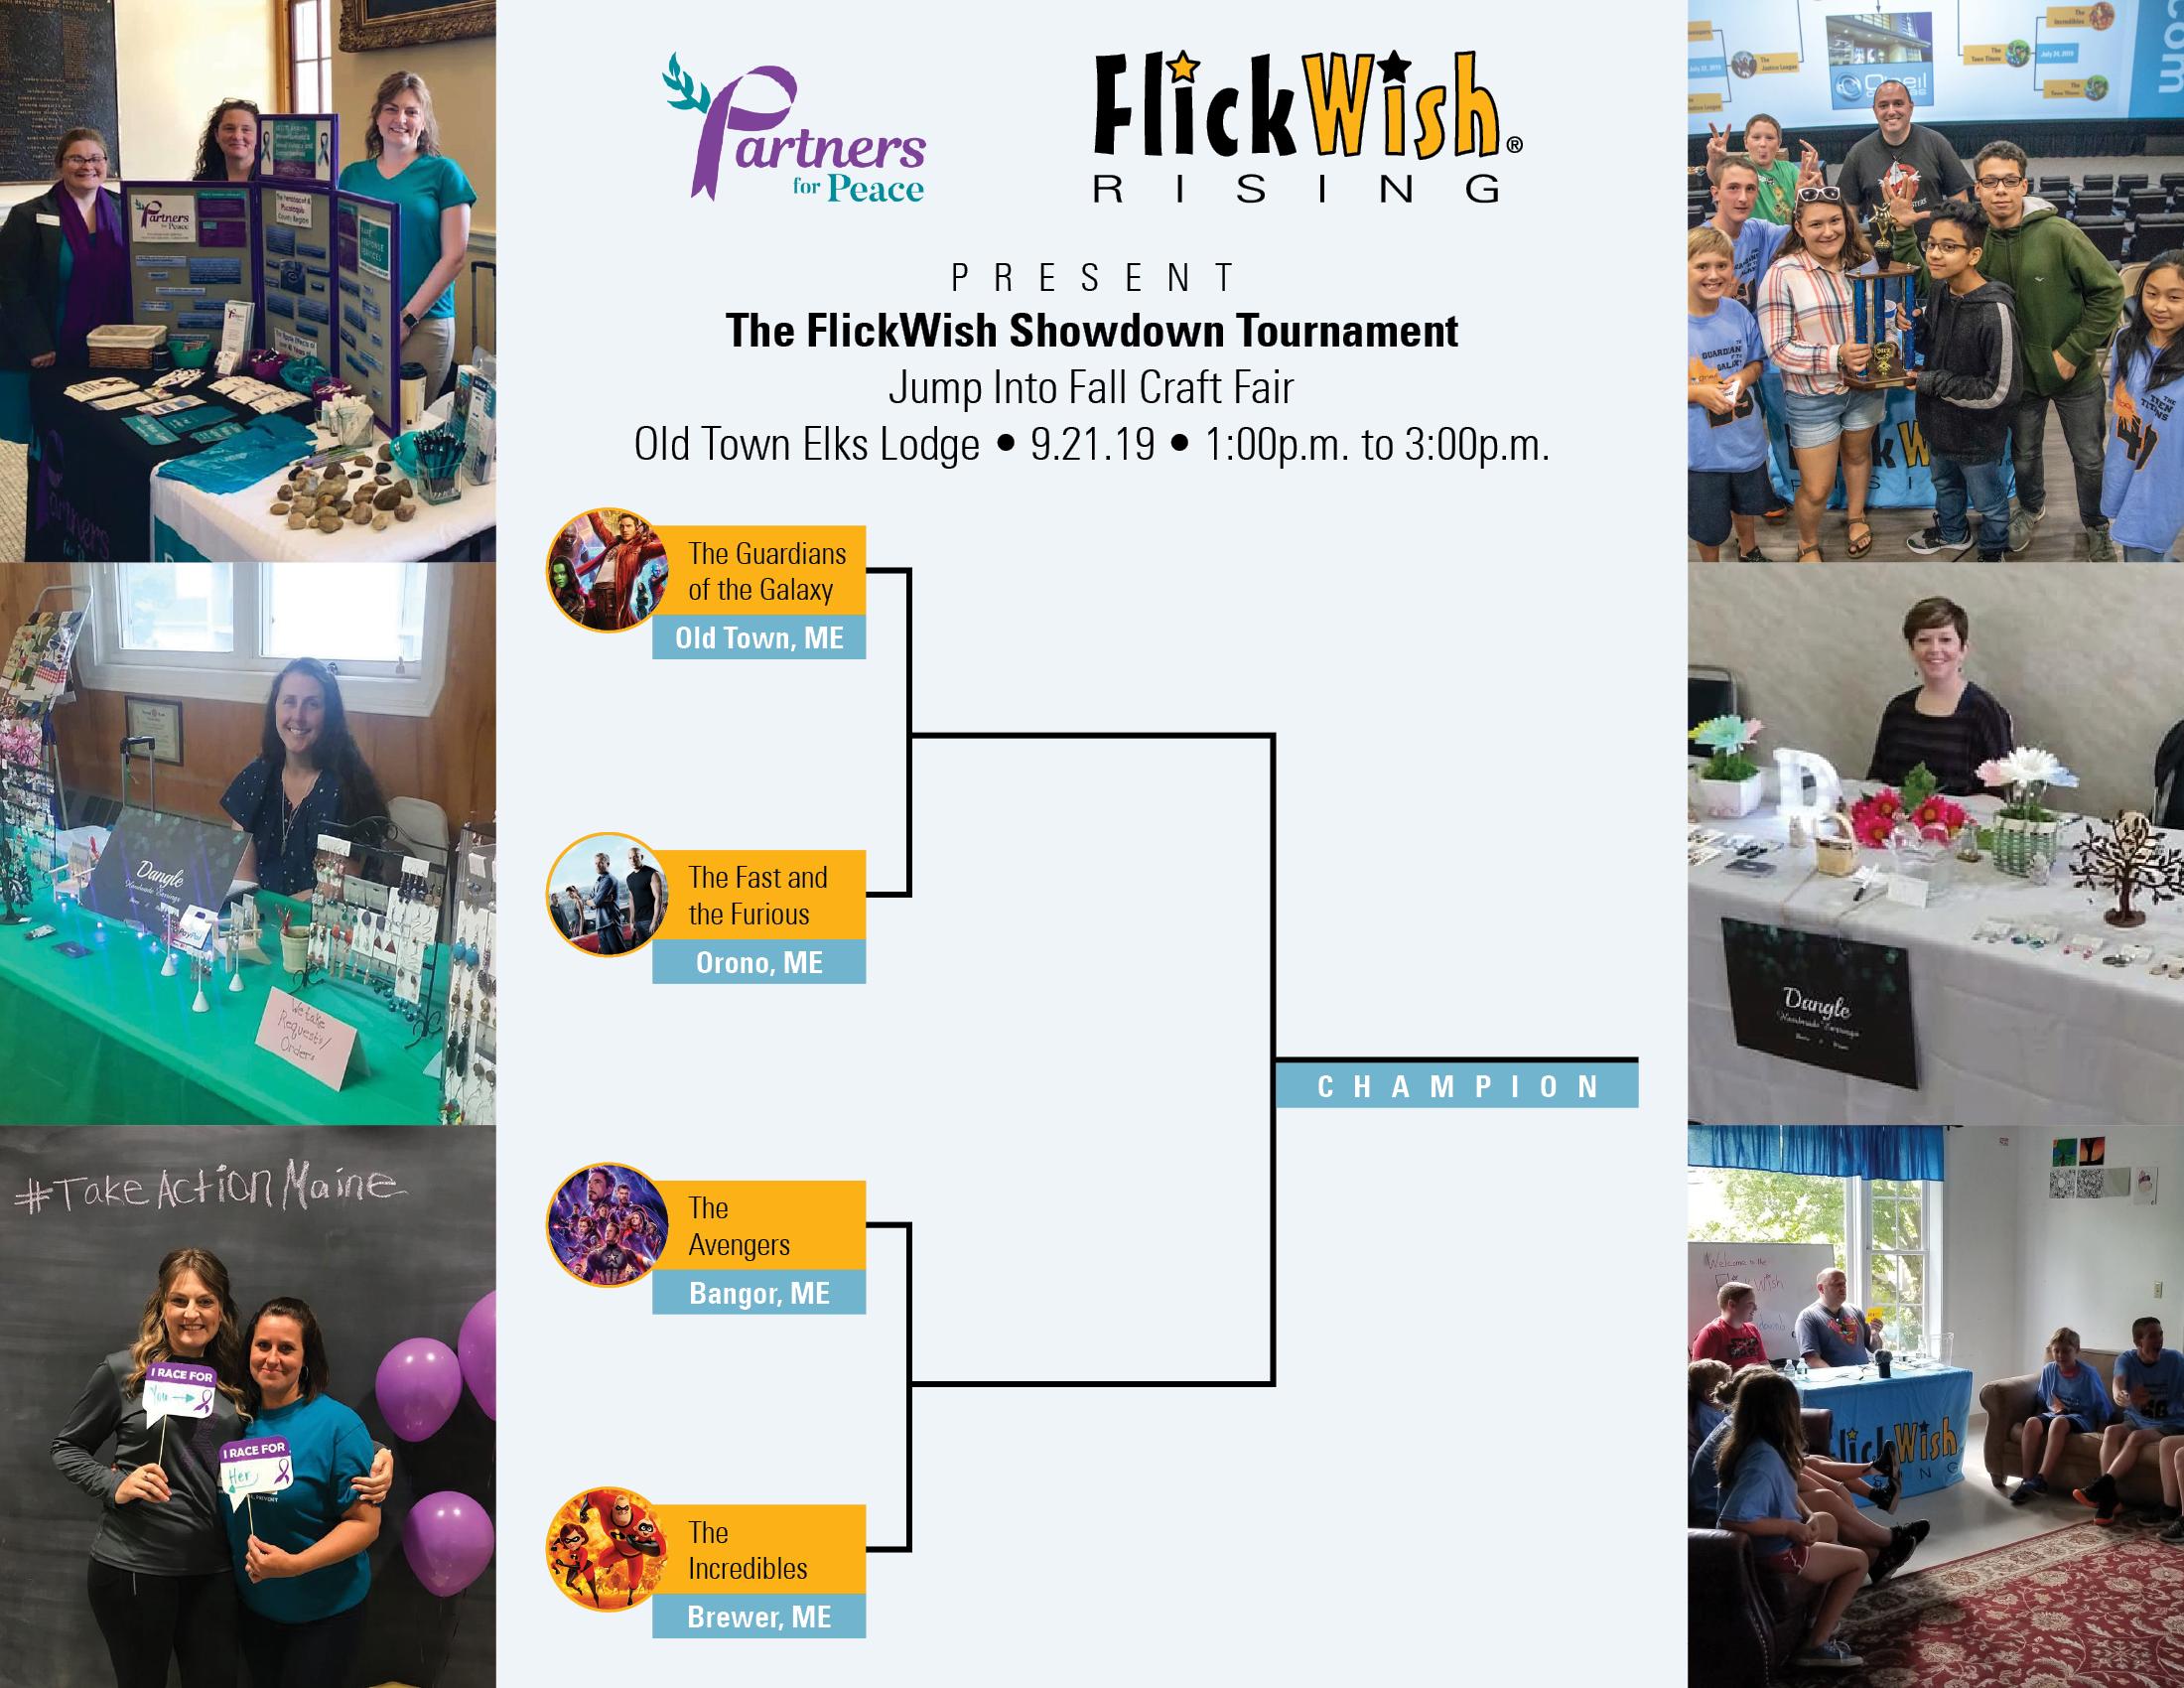 The FlickWish Showdown Tournament